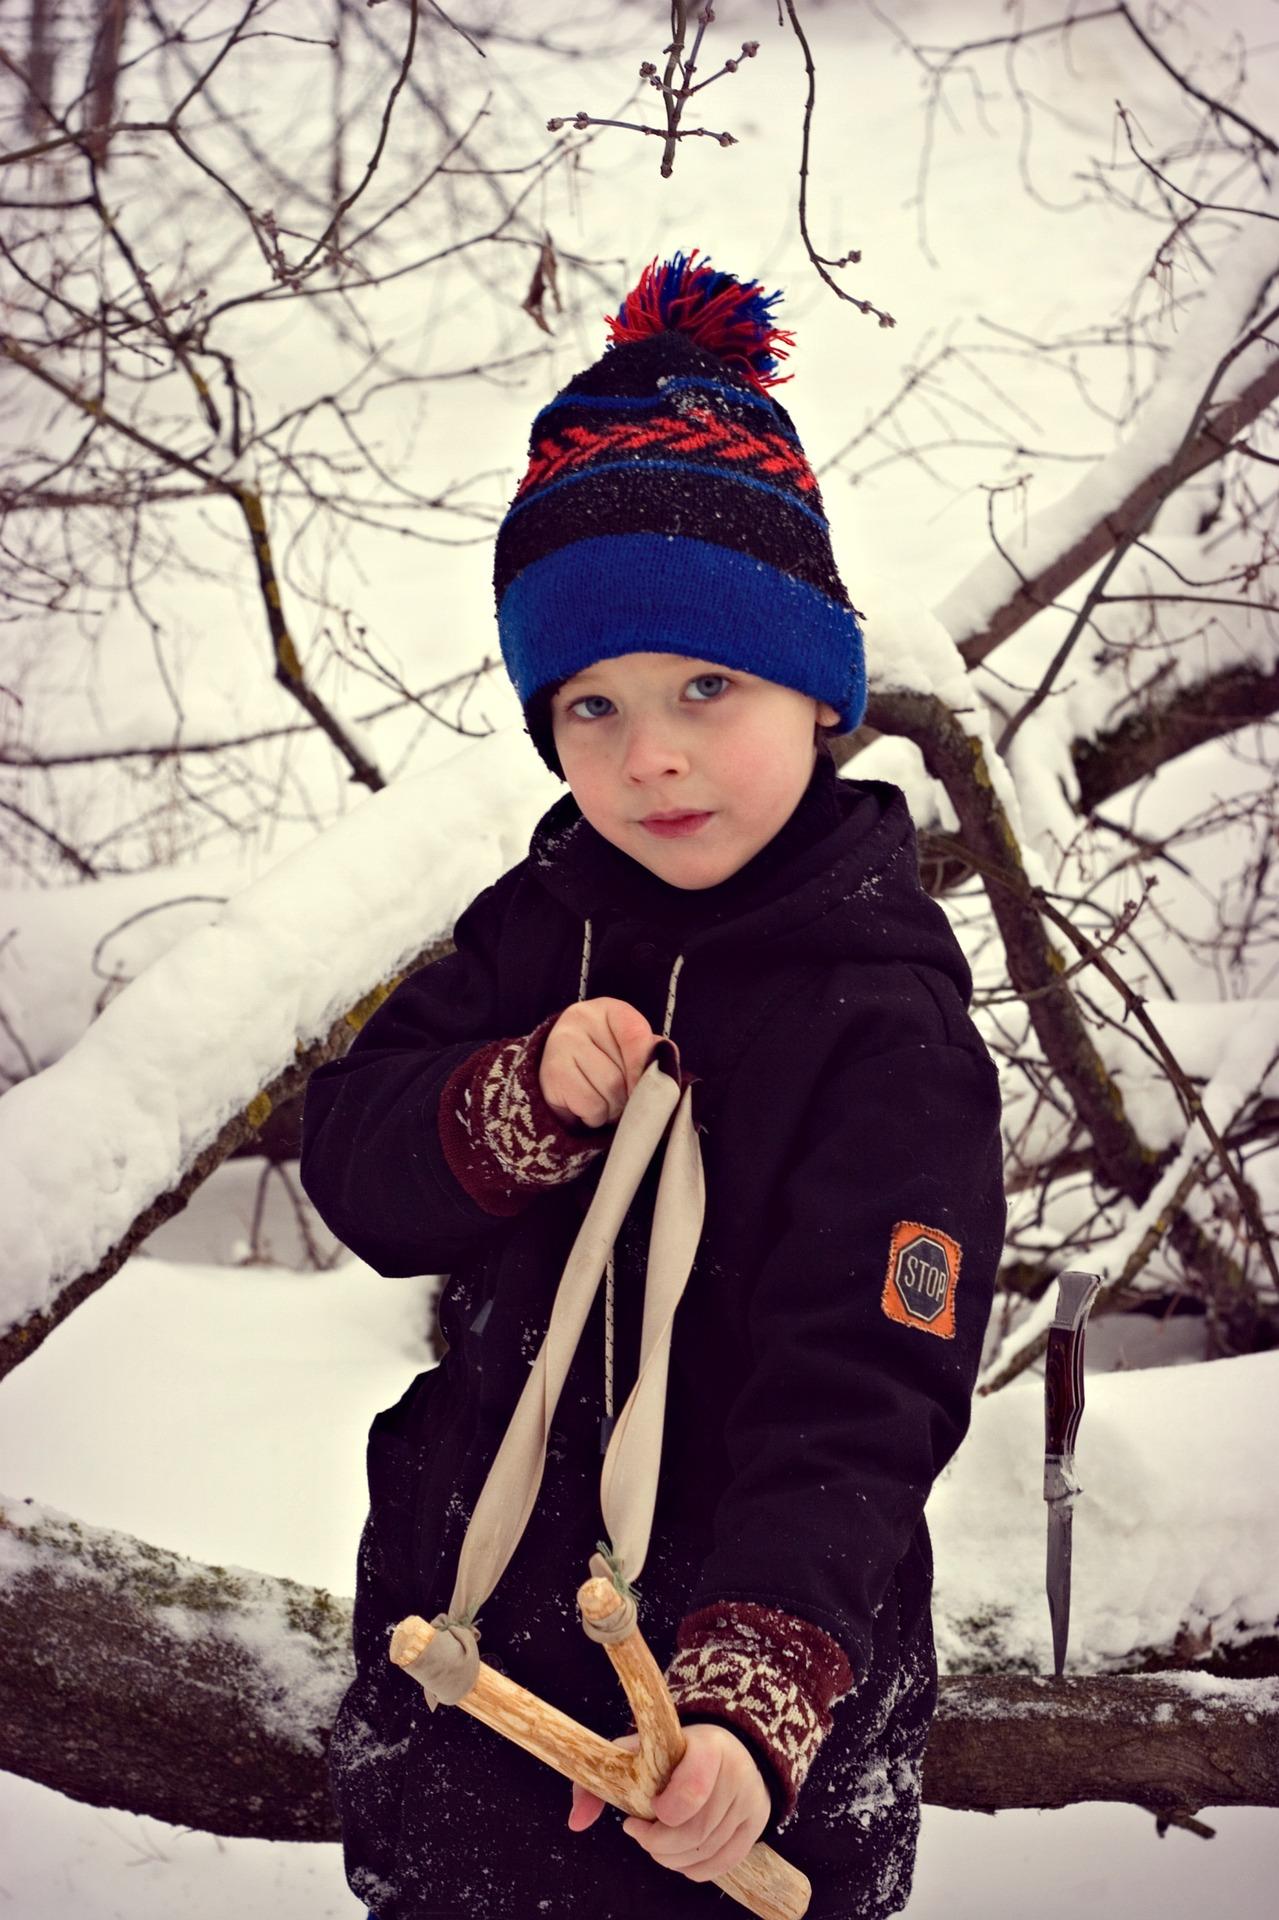 Pixabay - boy with slingshot